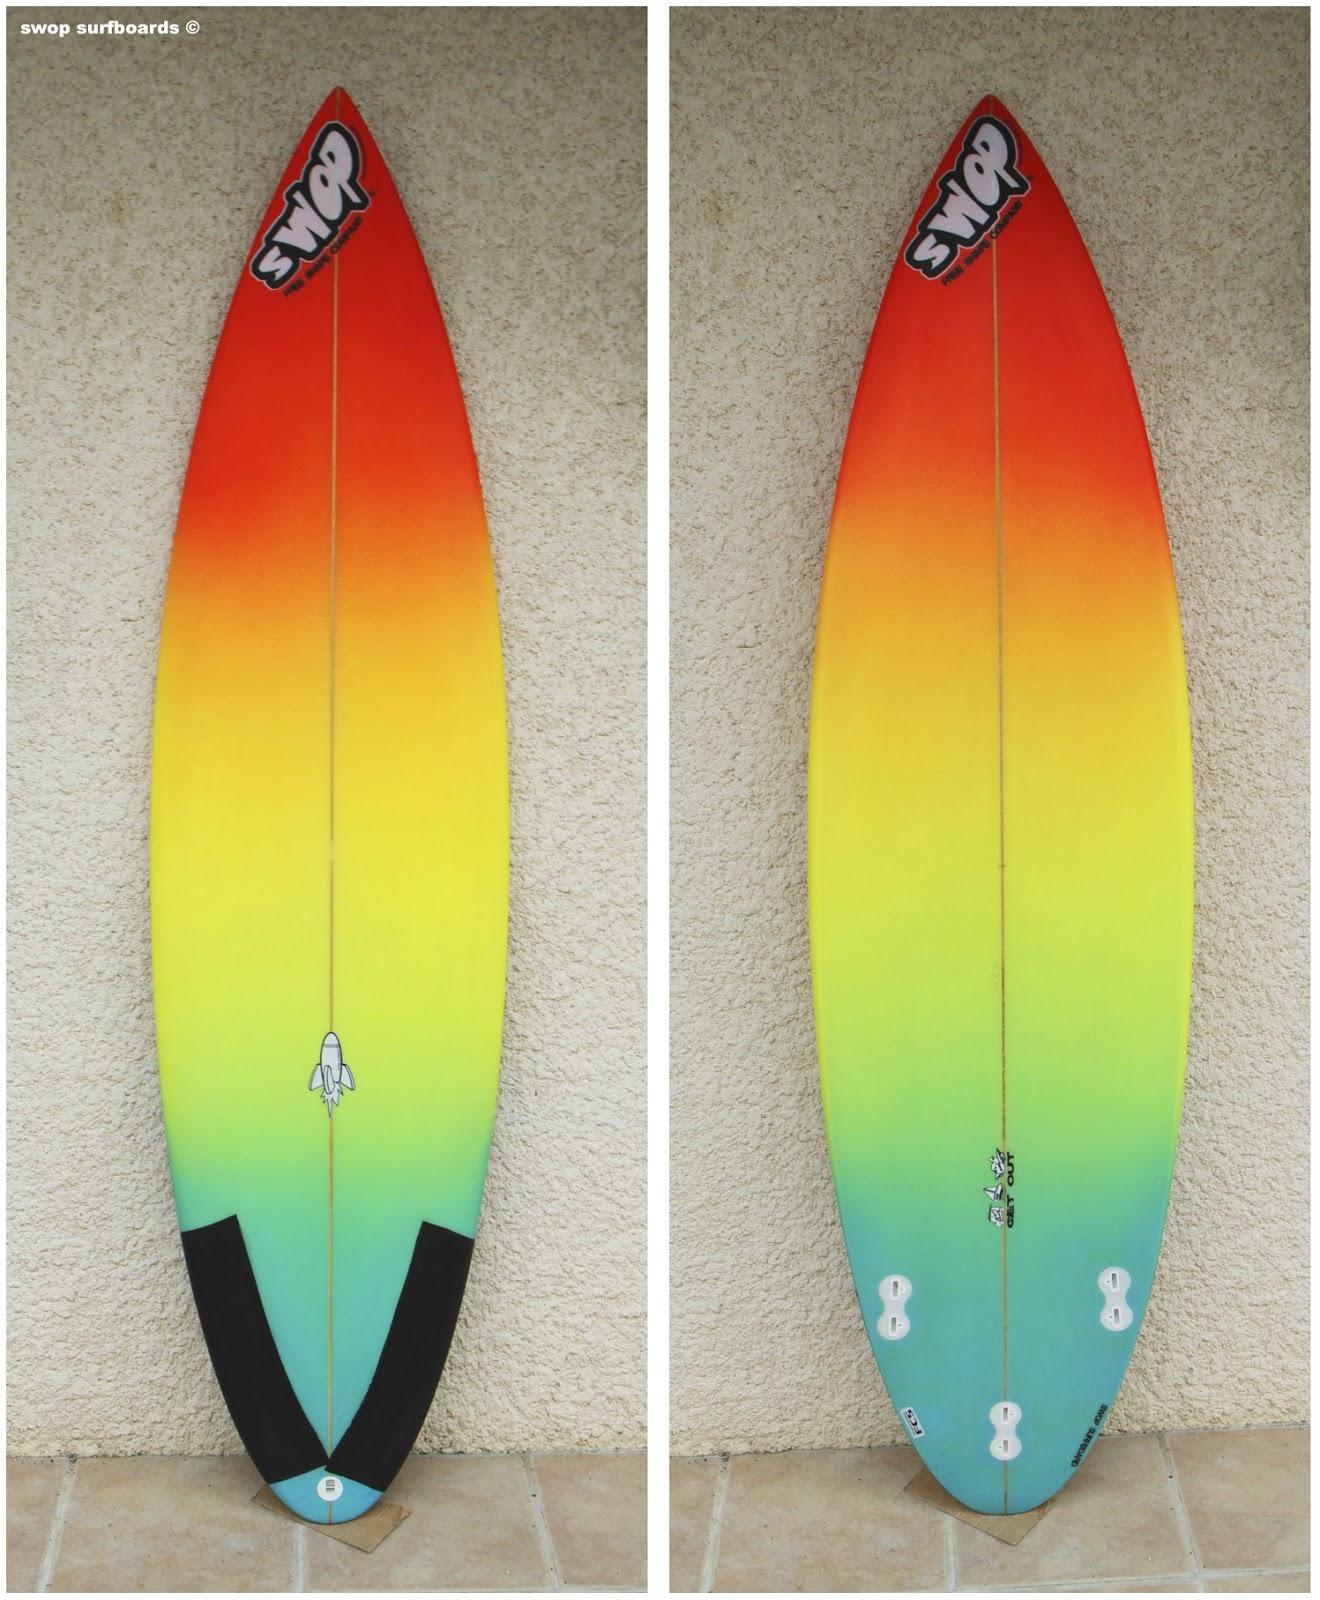 Swop surfboards rainbow shortboard - Planche de surf deco ...